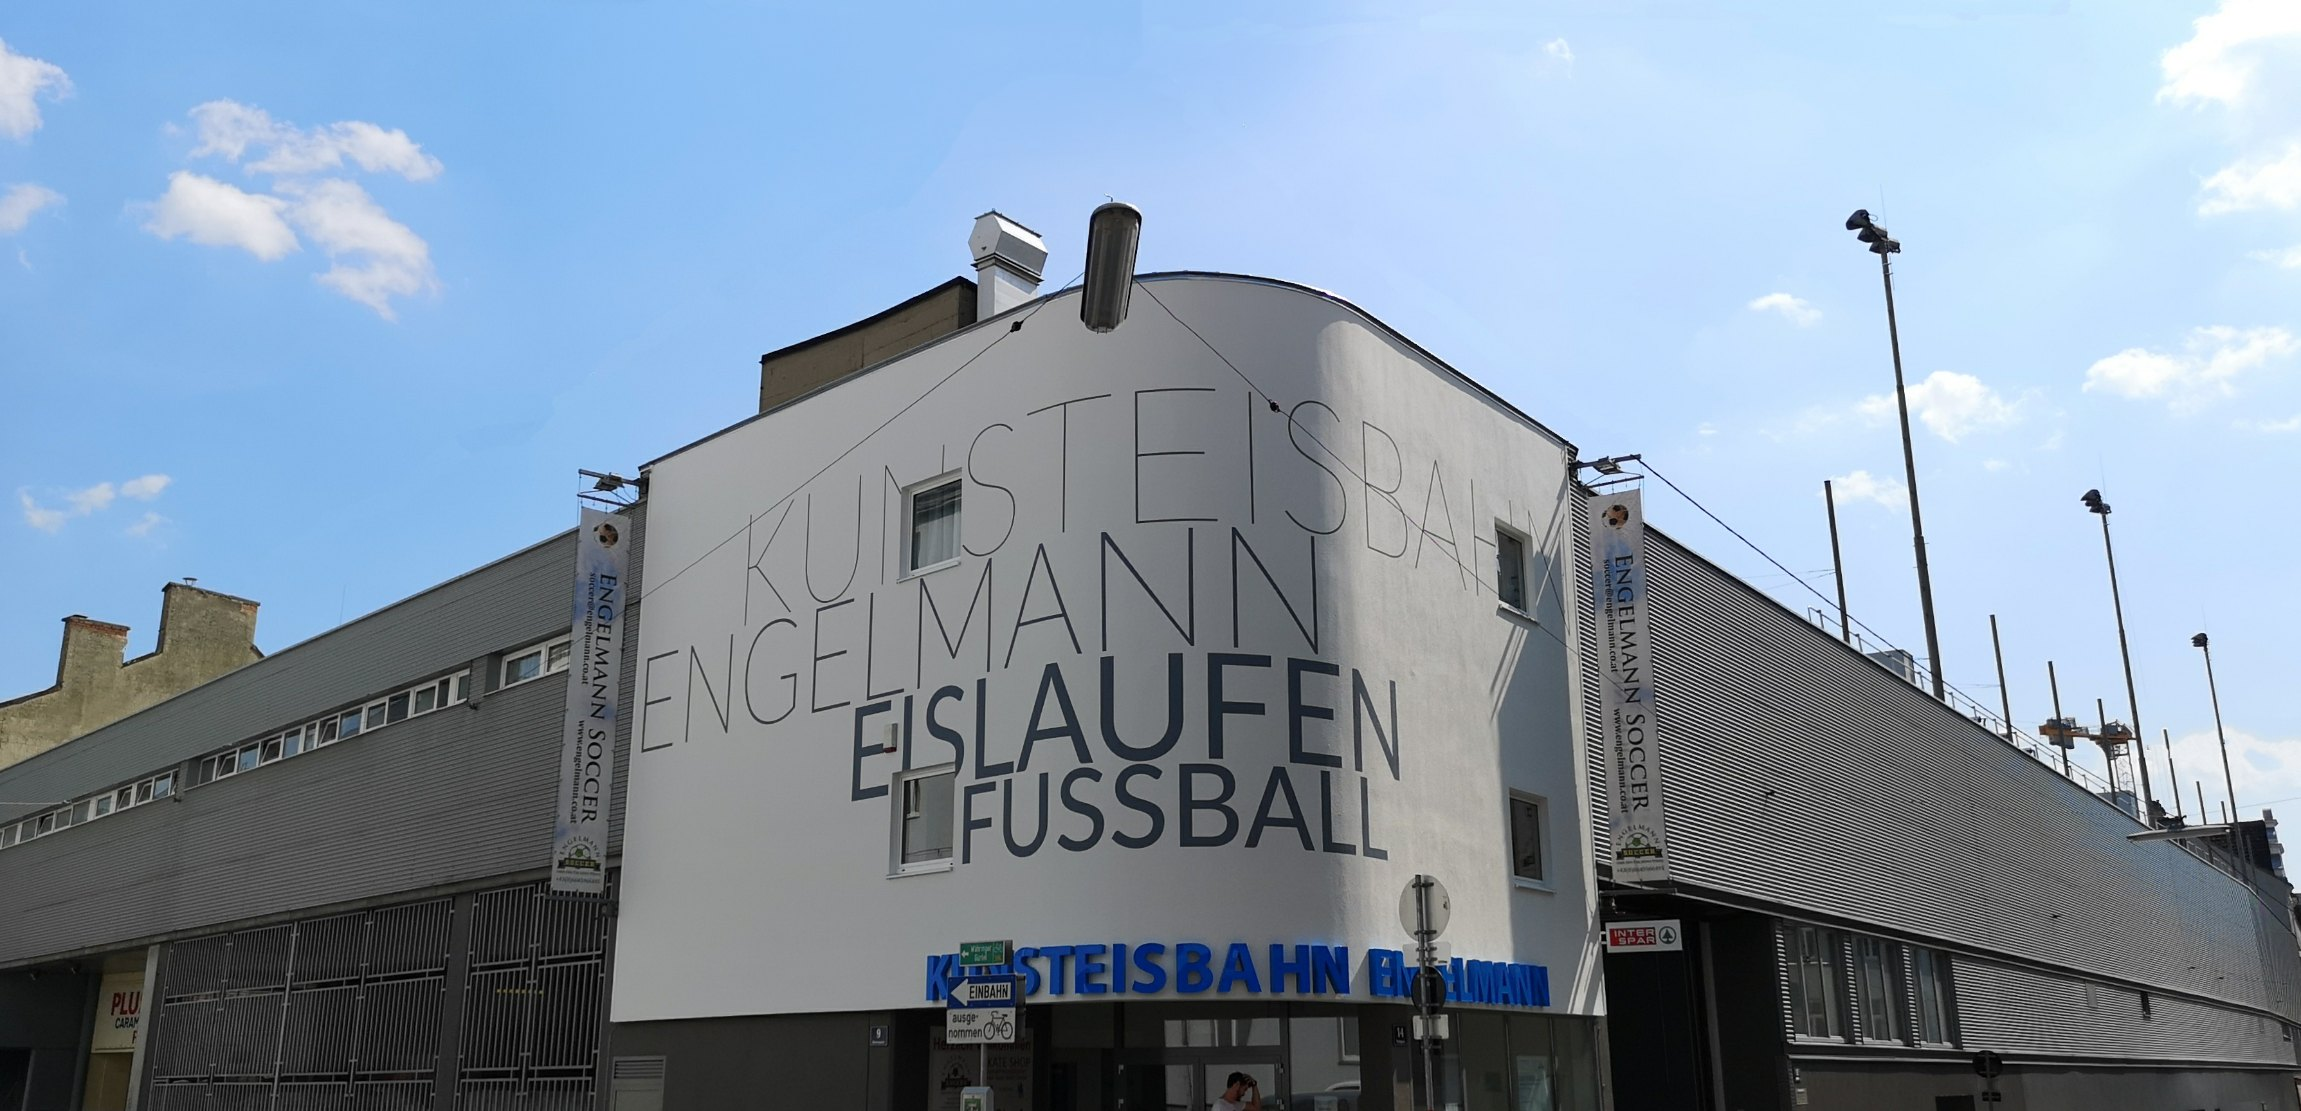 Engelmann Kunsteisbahn & Engelmann Soccer